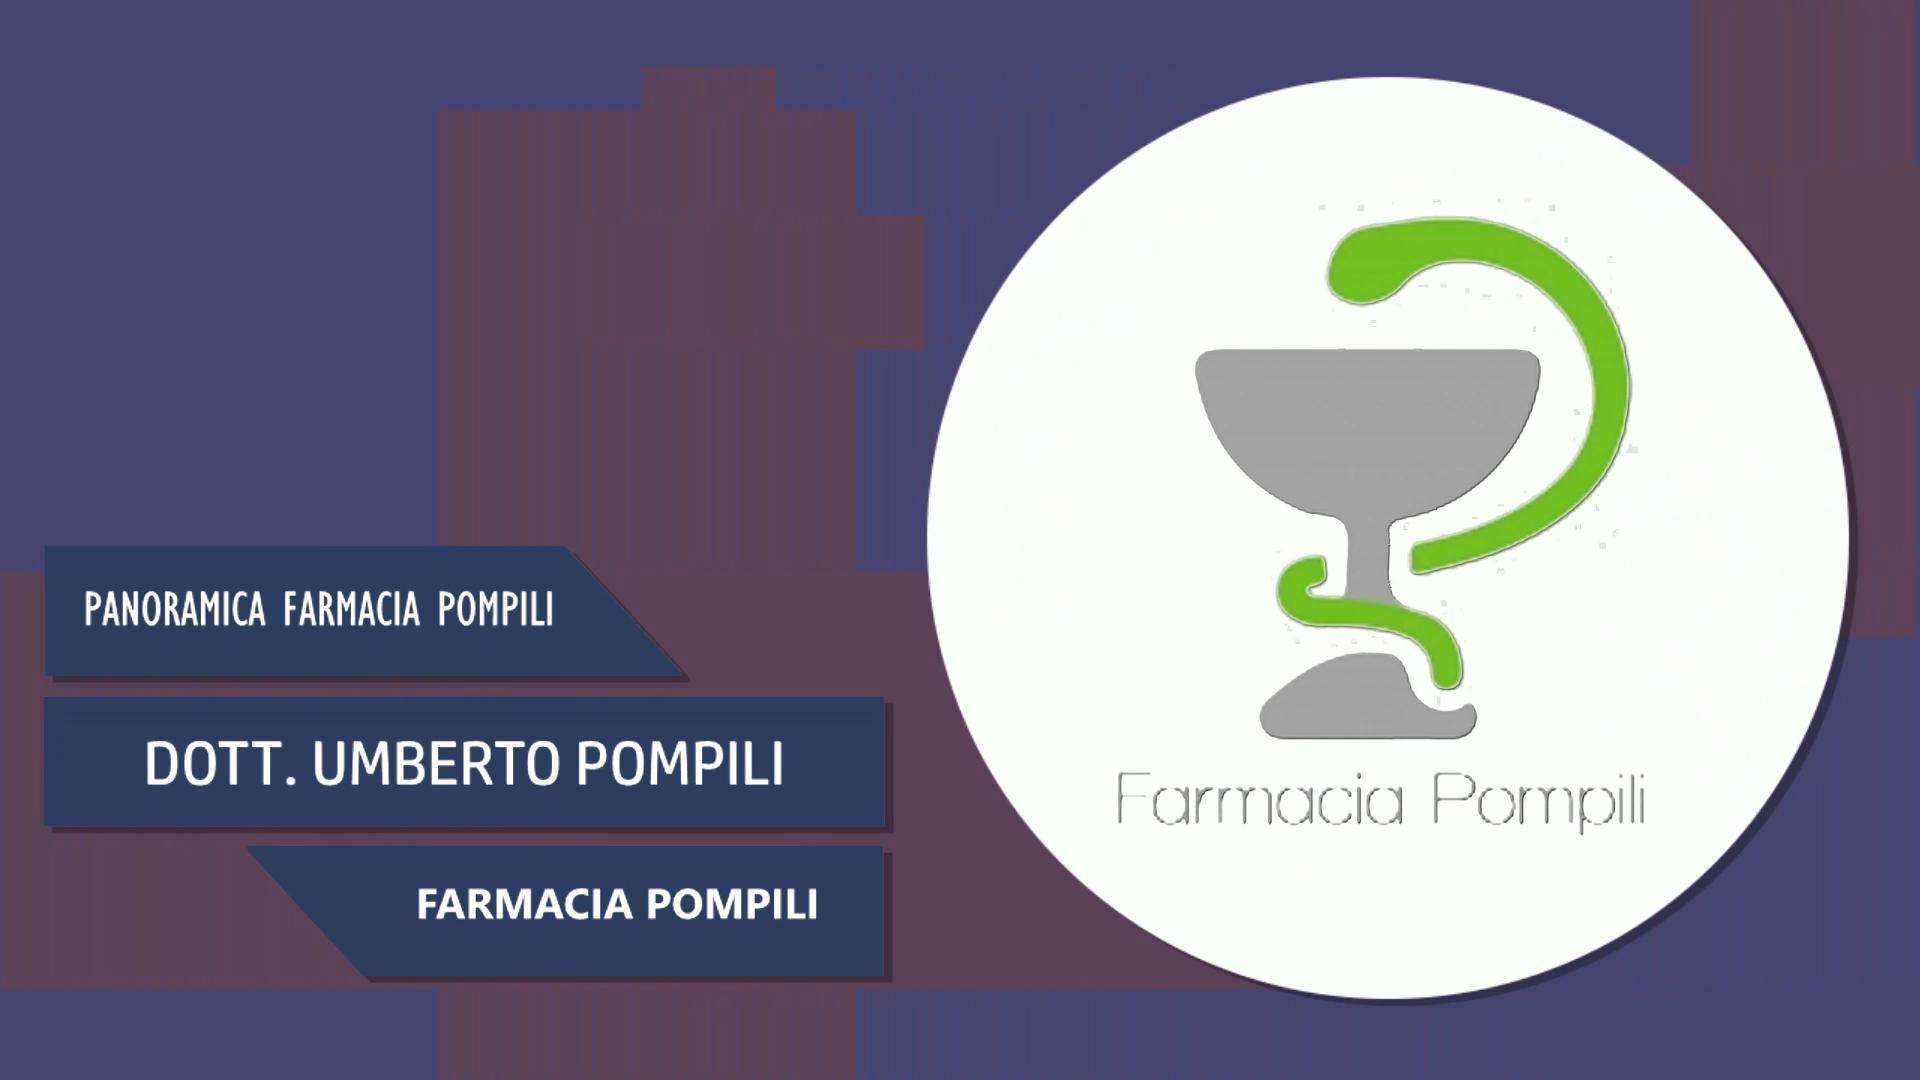 Intervista al Dott. Umberto Pompili – Farmacia Pompili